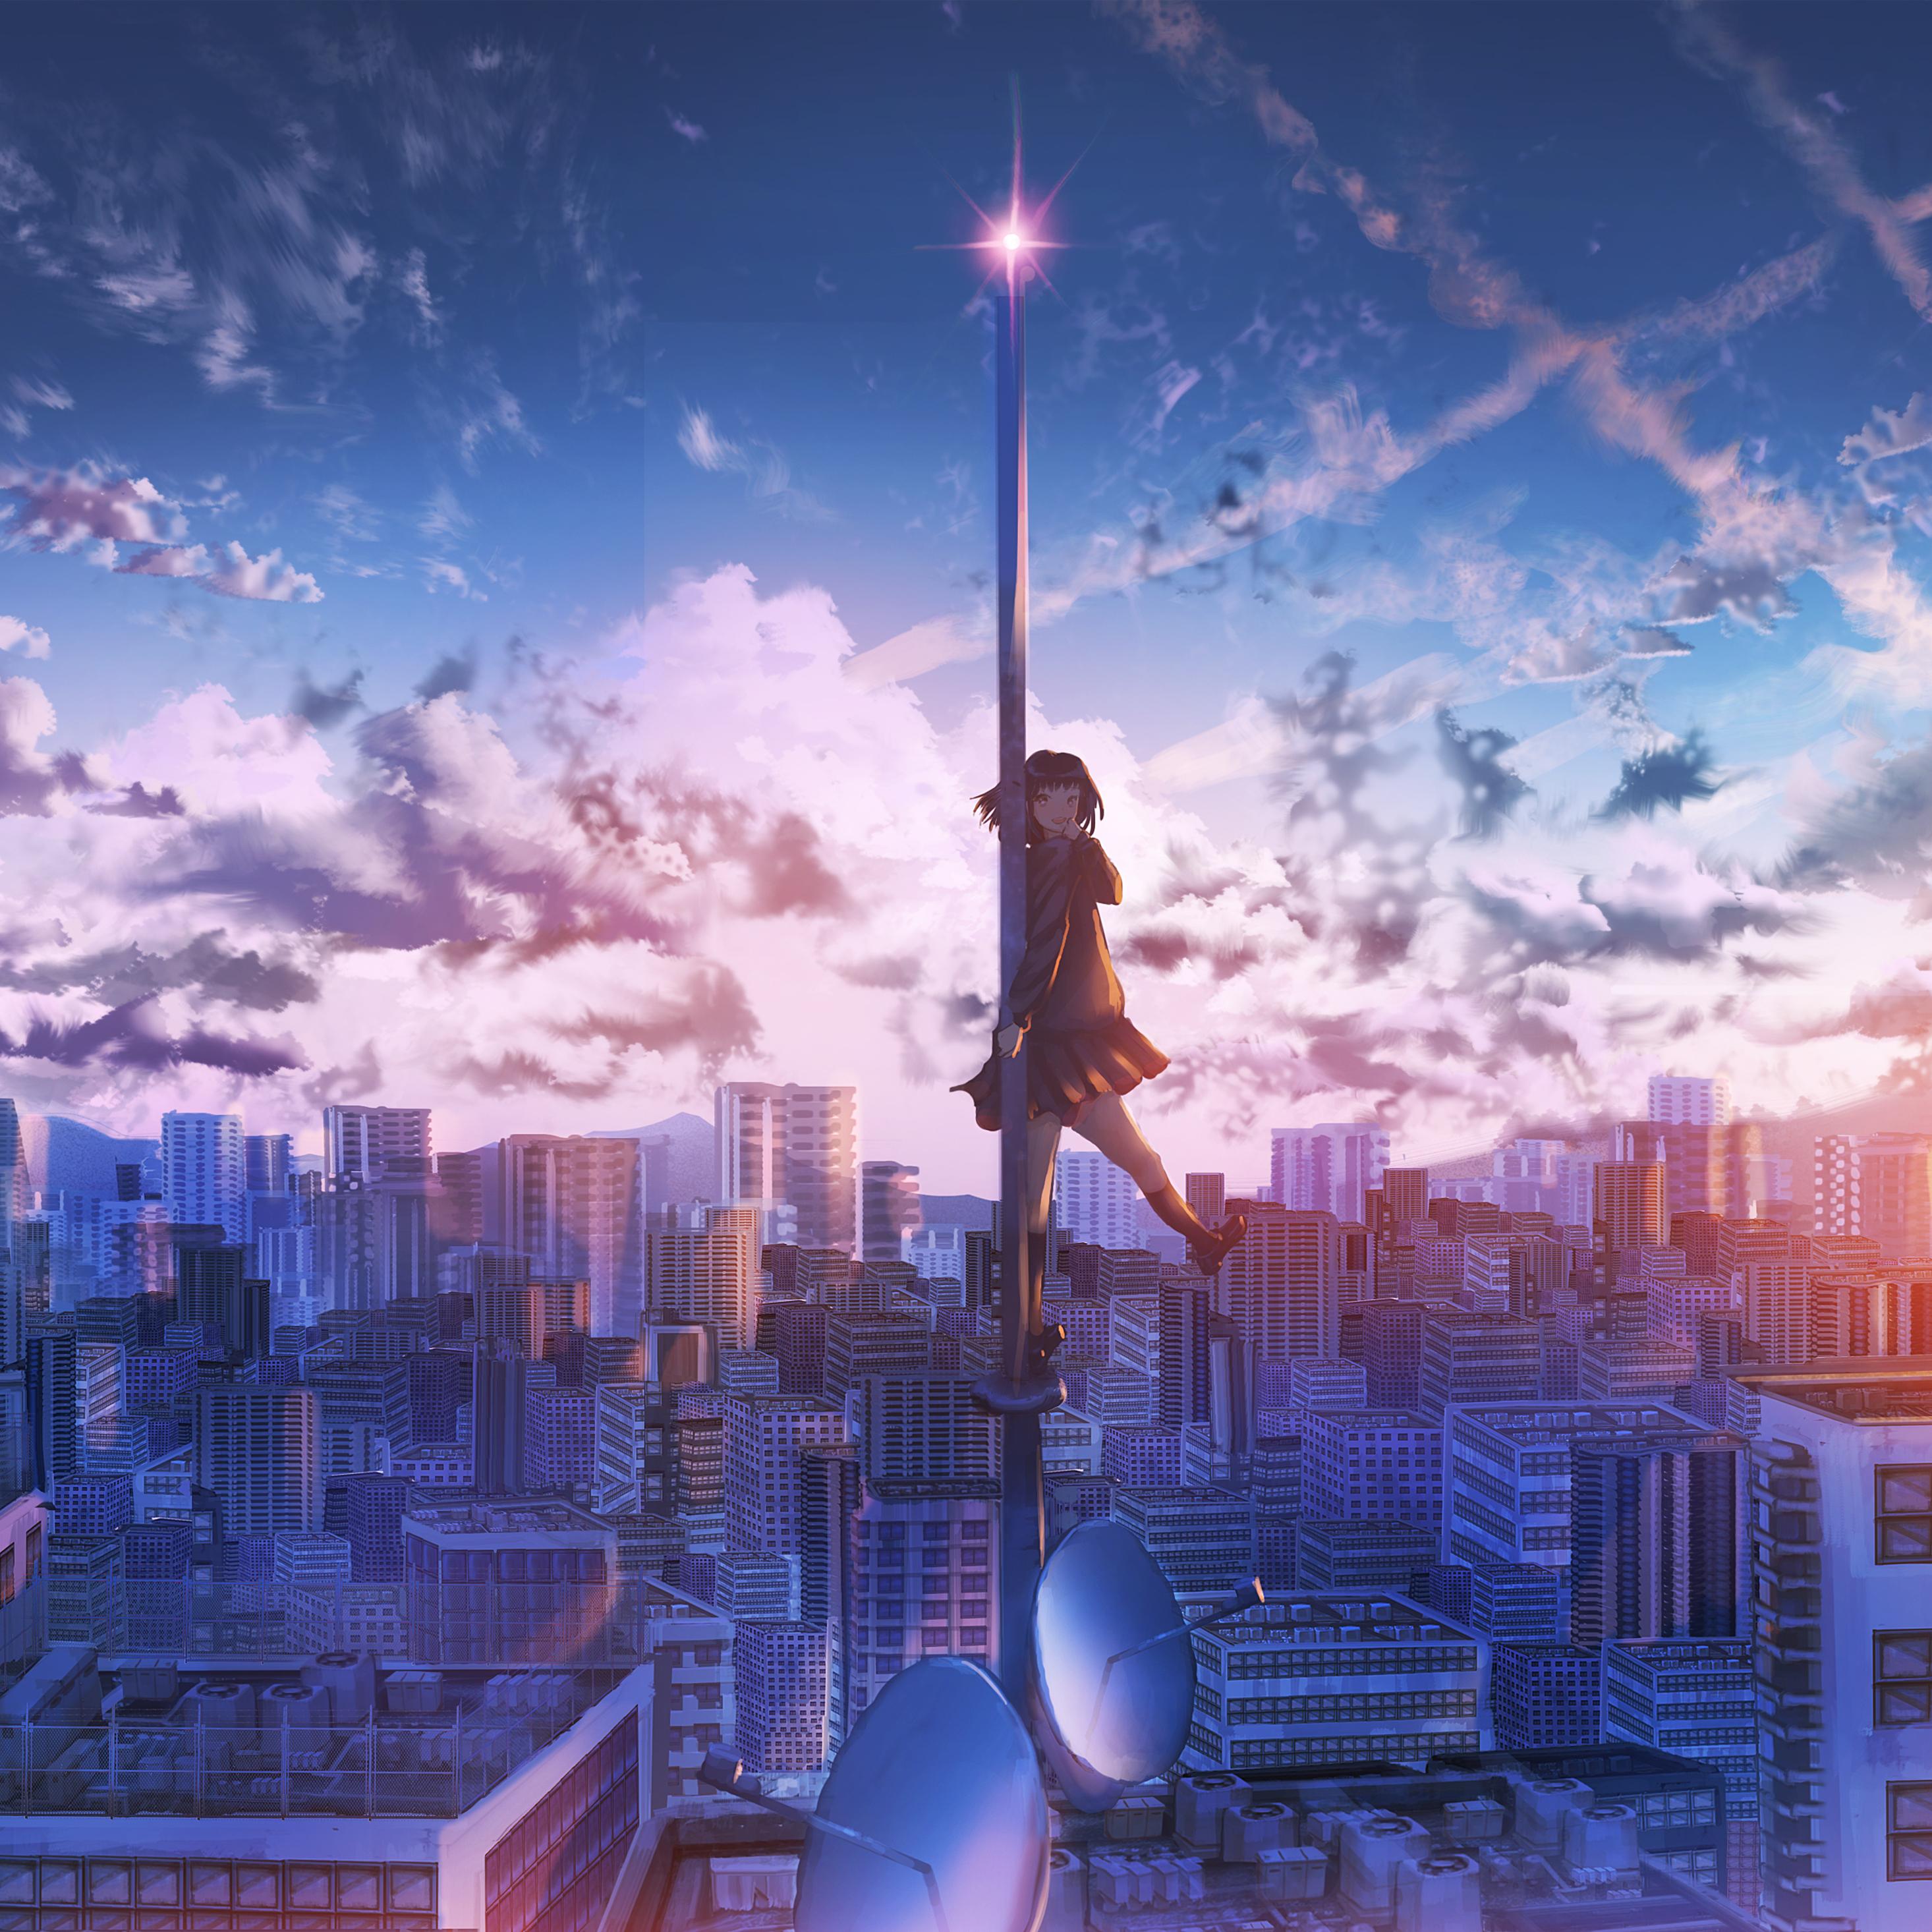 2932x2932 Anime Girl City Building Height 4k Ipad Pro Retina